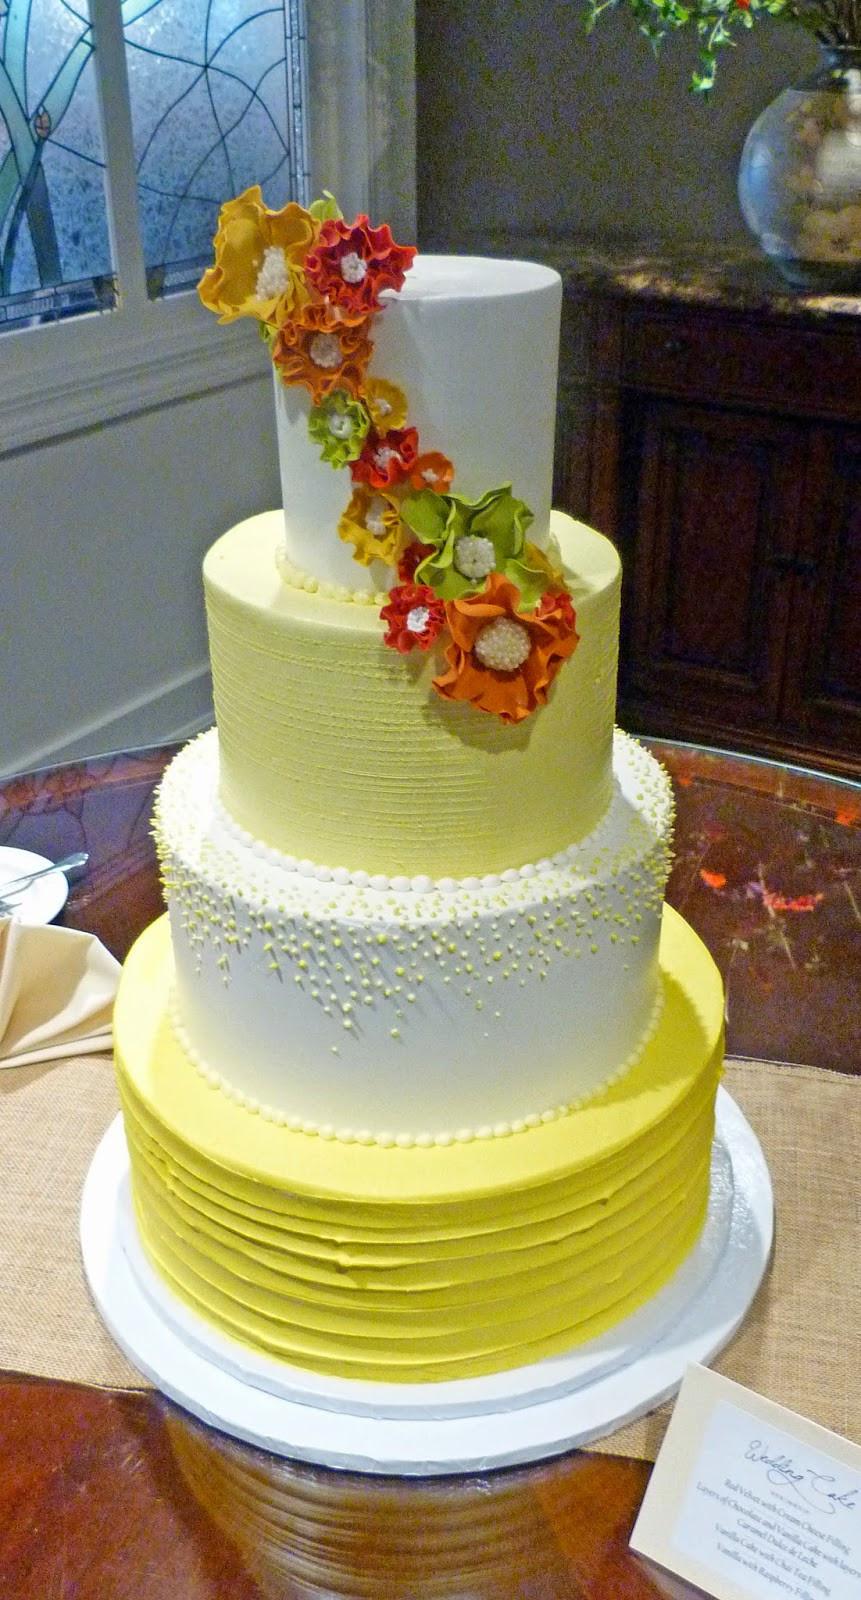 Wedding Cakes Massachusetts  Artisan Bake Shop Independence Harbor Weddings Assonet MA